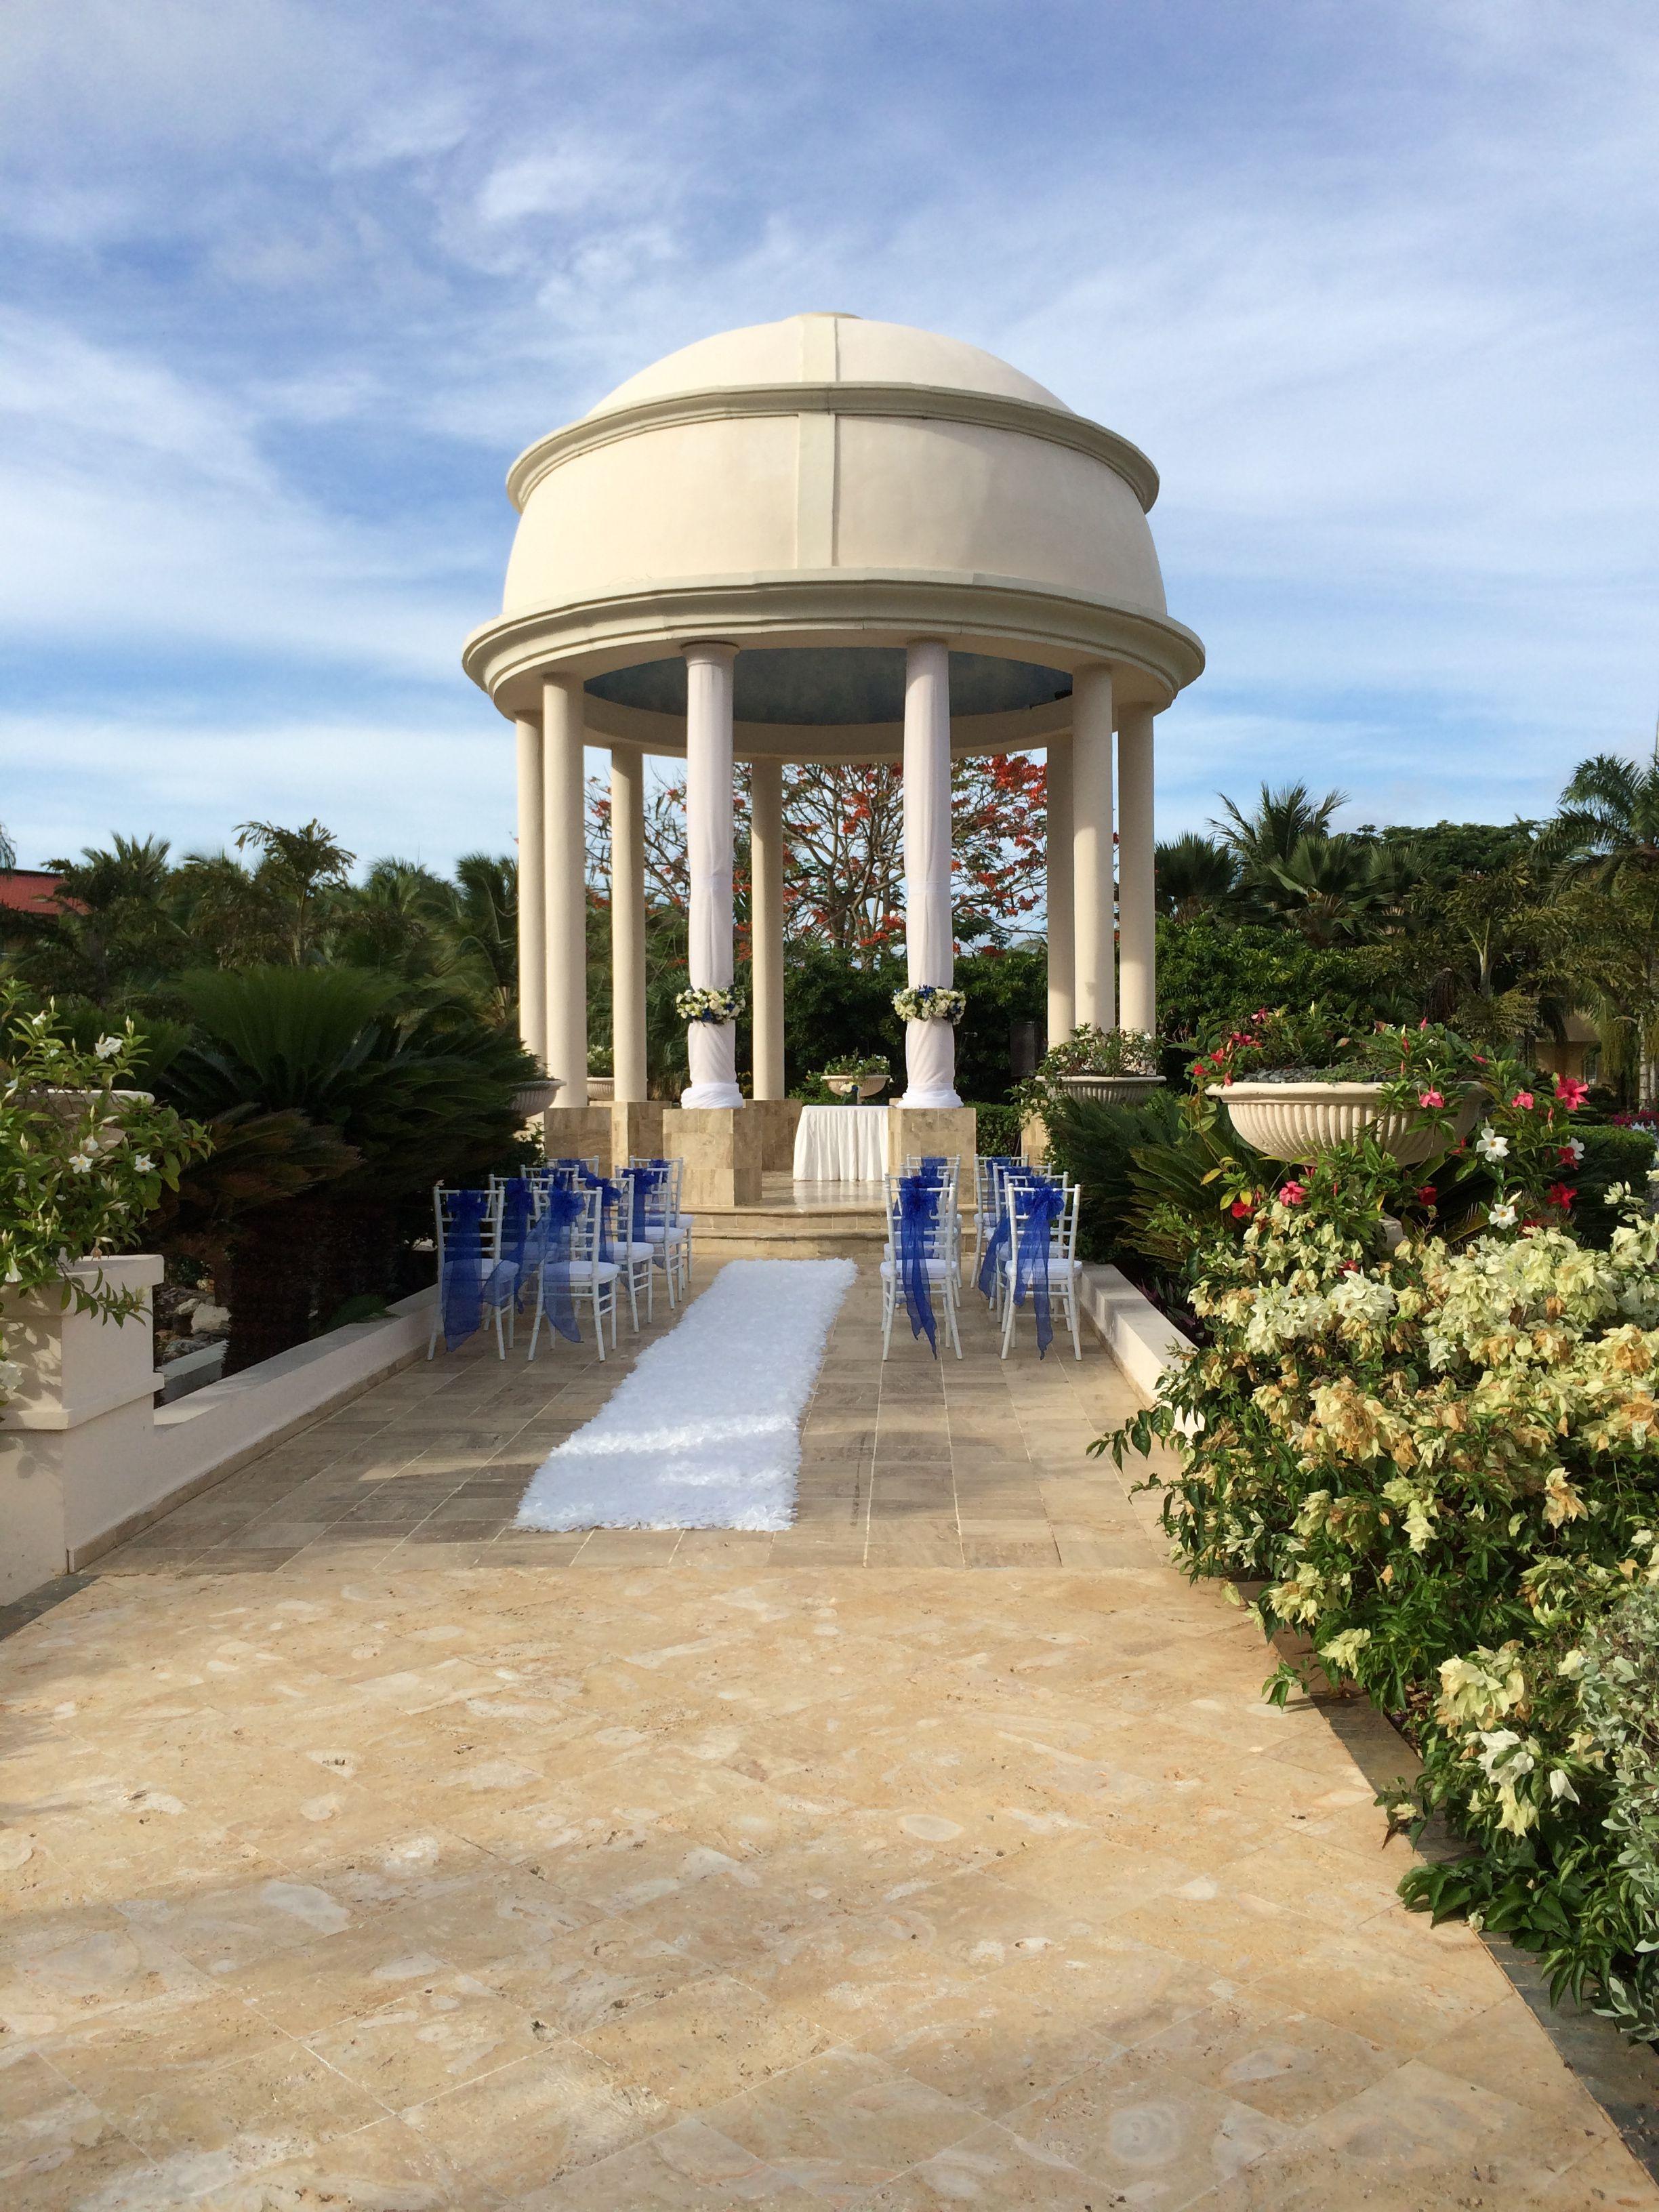 We Love This Wedding Gazebo At Dreams Punta Cana Resort Spa Destinationwedding Wedding Gazebo Puntacana Gazebo Wedding Dreams Punta Cana Dreams Resorts